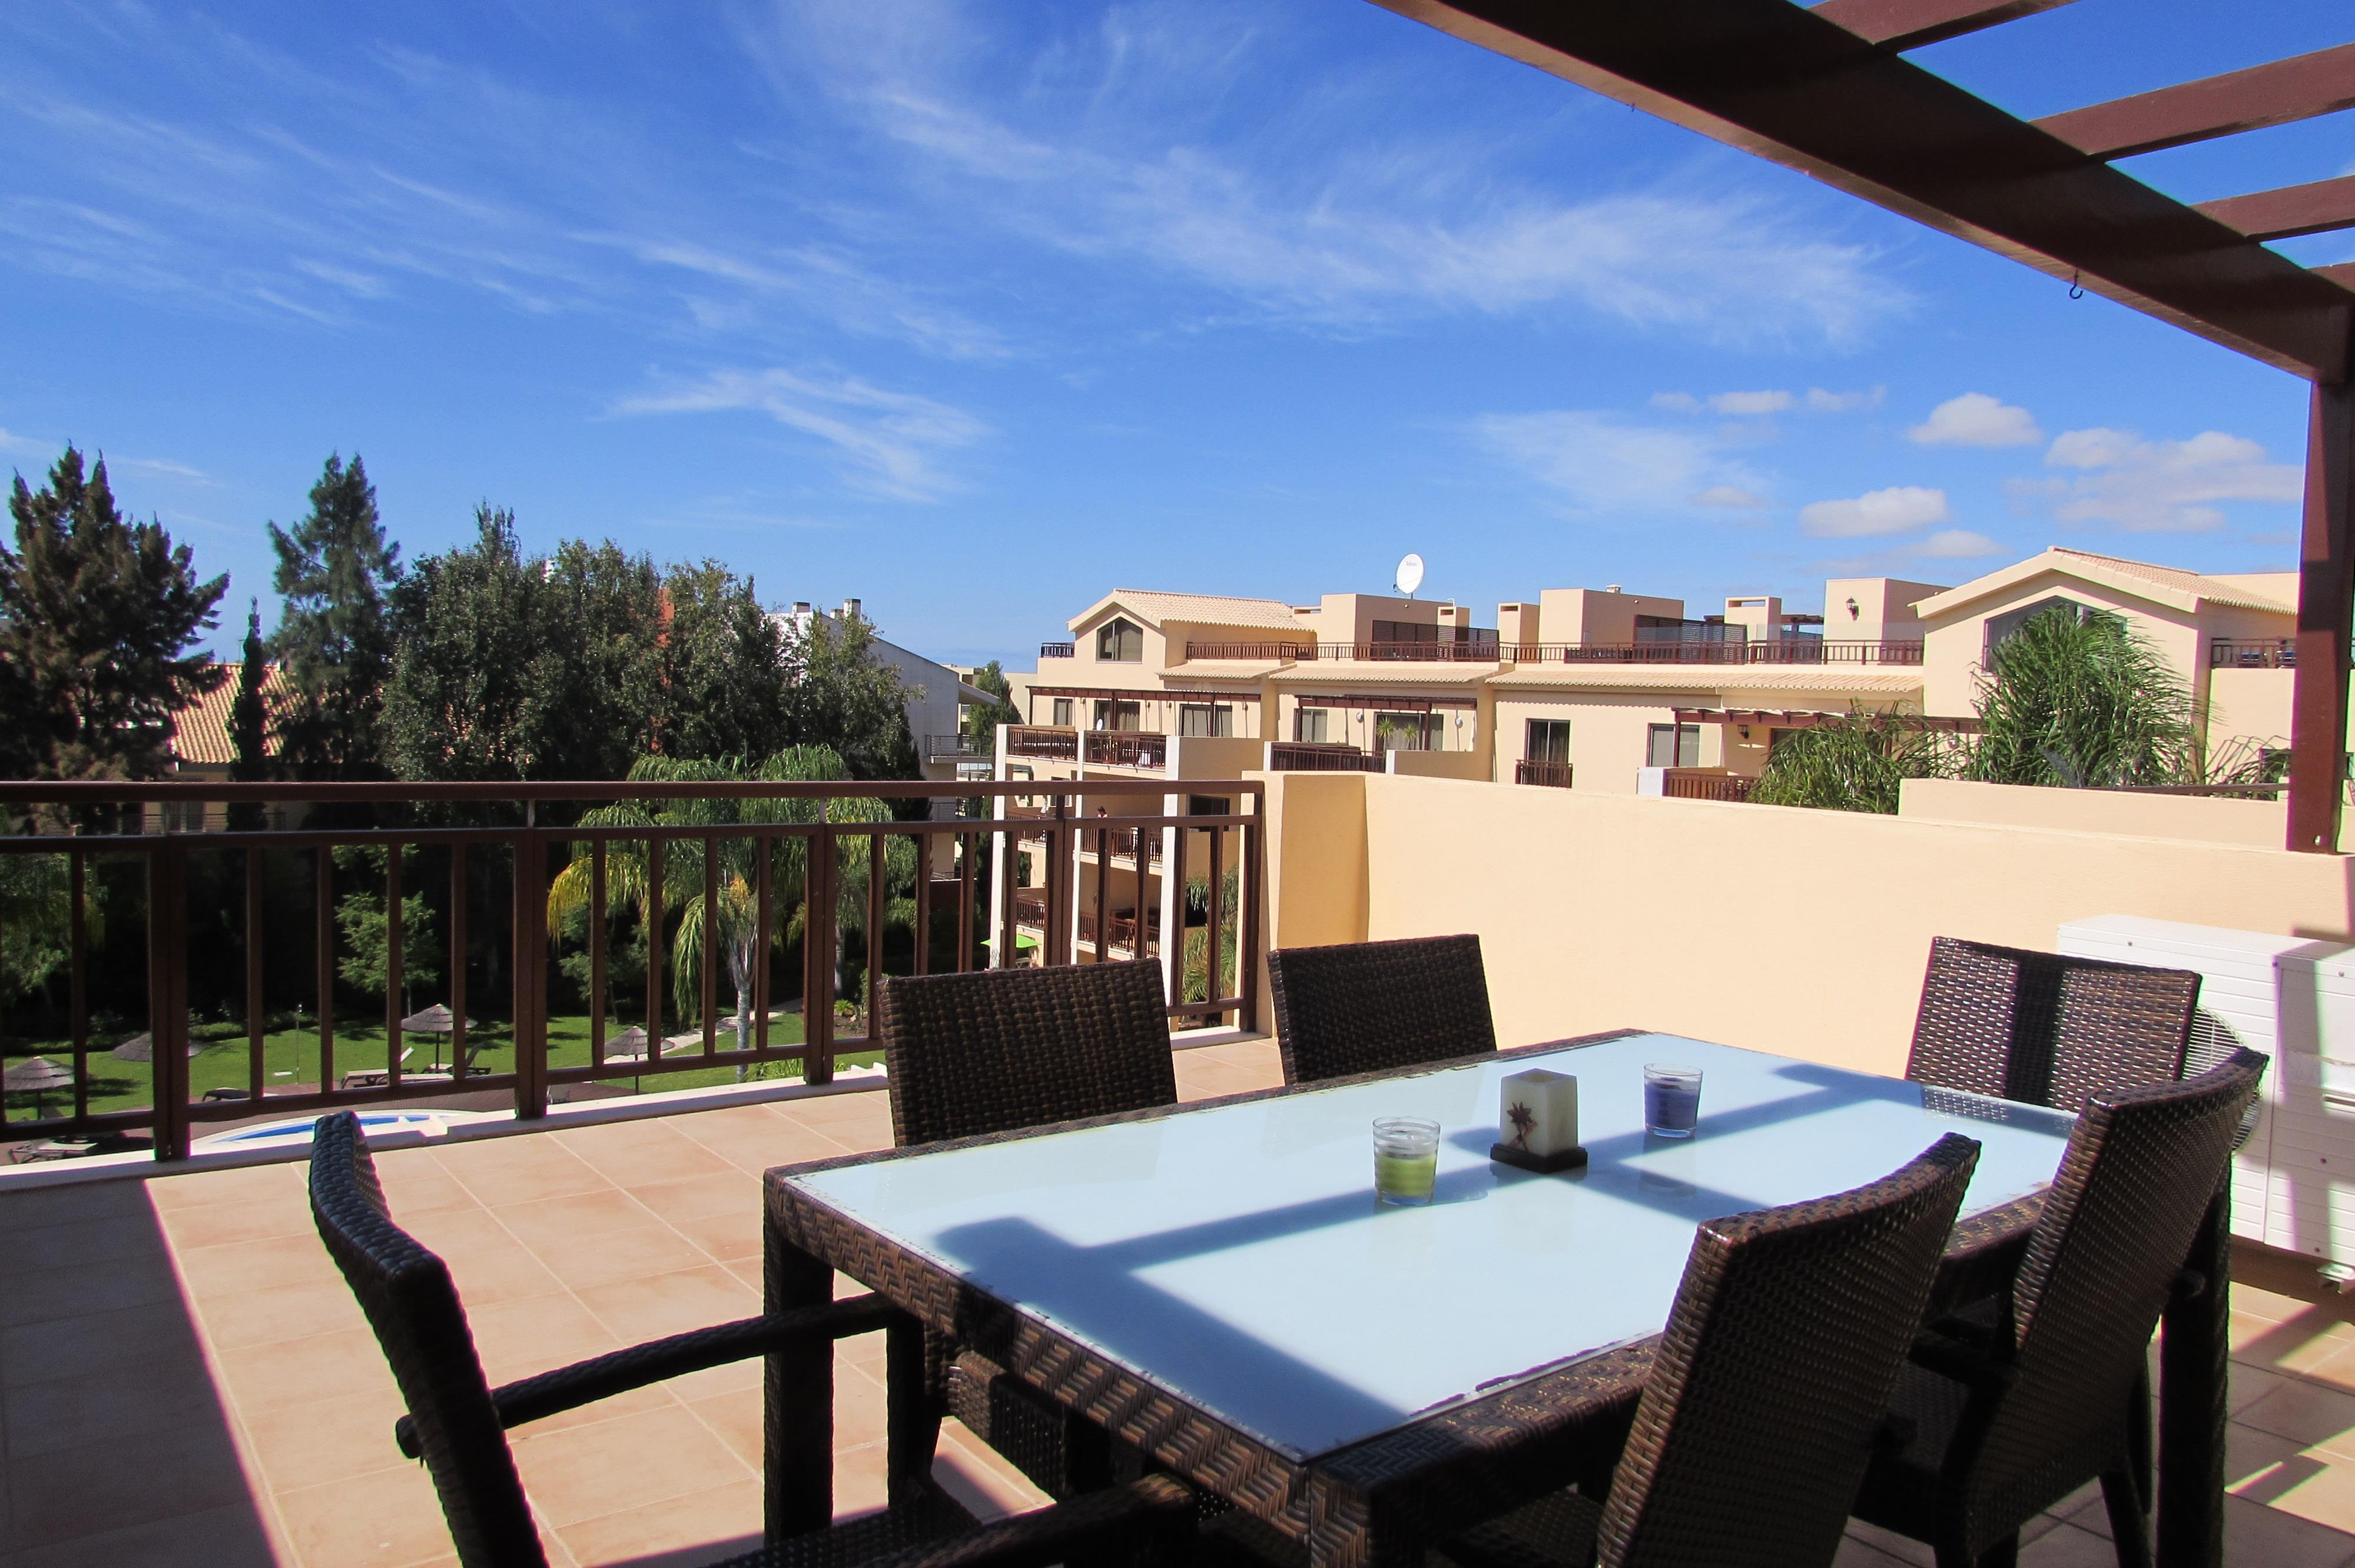 Duplex for Sale at Duplex, 3 bedrooms, for Sale Loule, Algarve, 8125-407 Portugal